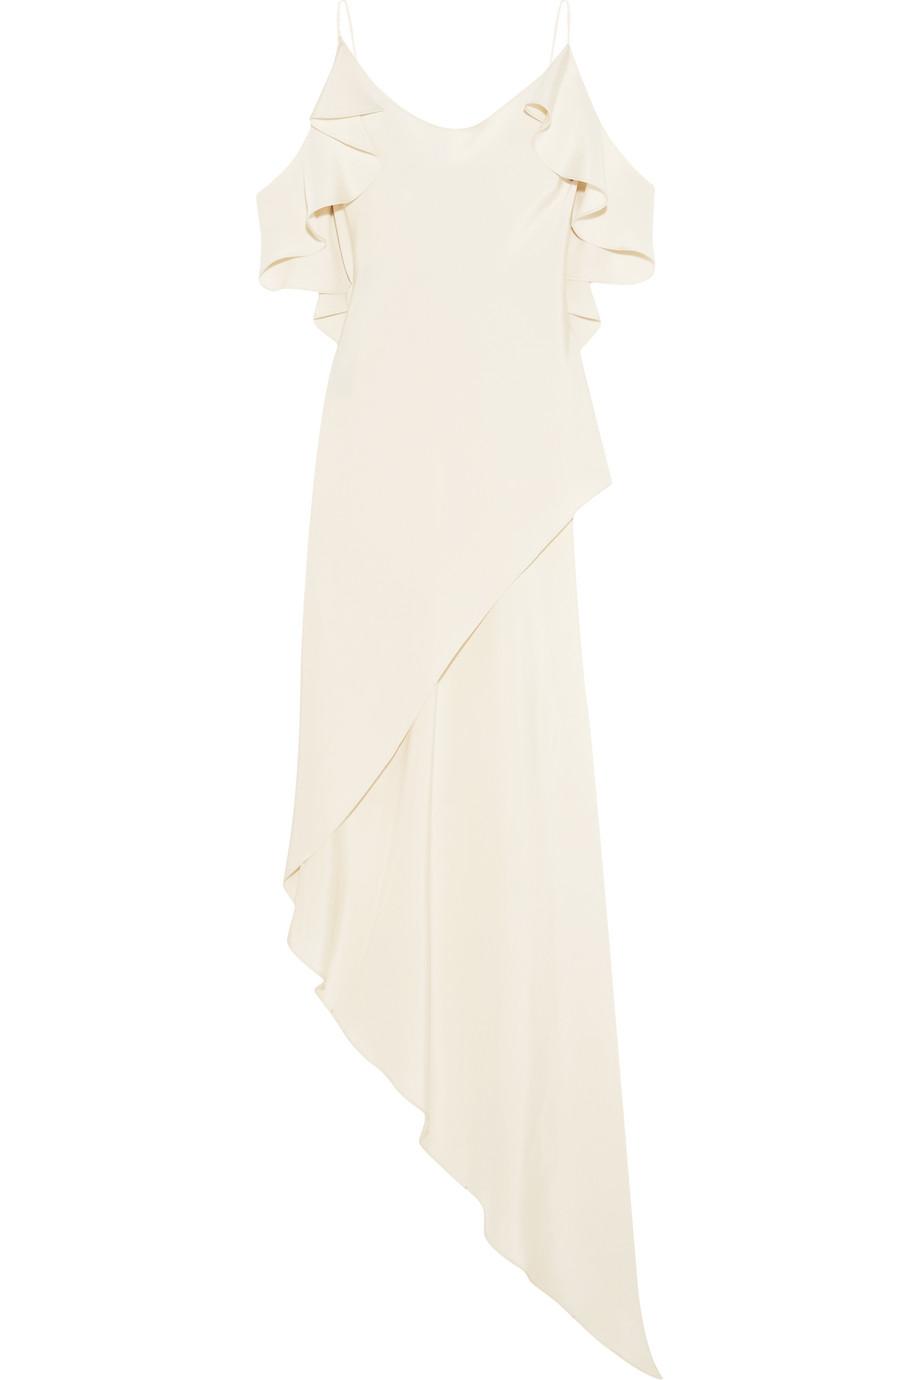 Spiral Ruffled Asymmetric Silk-Satin Camisole, White, Women's, Size: 4